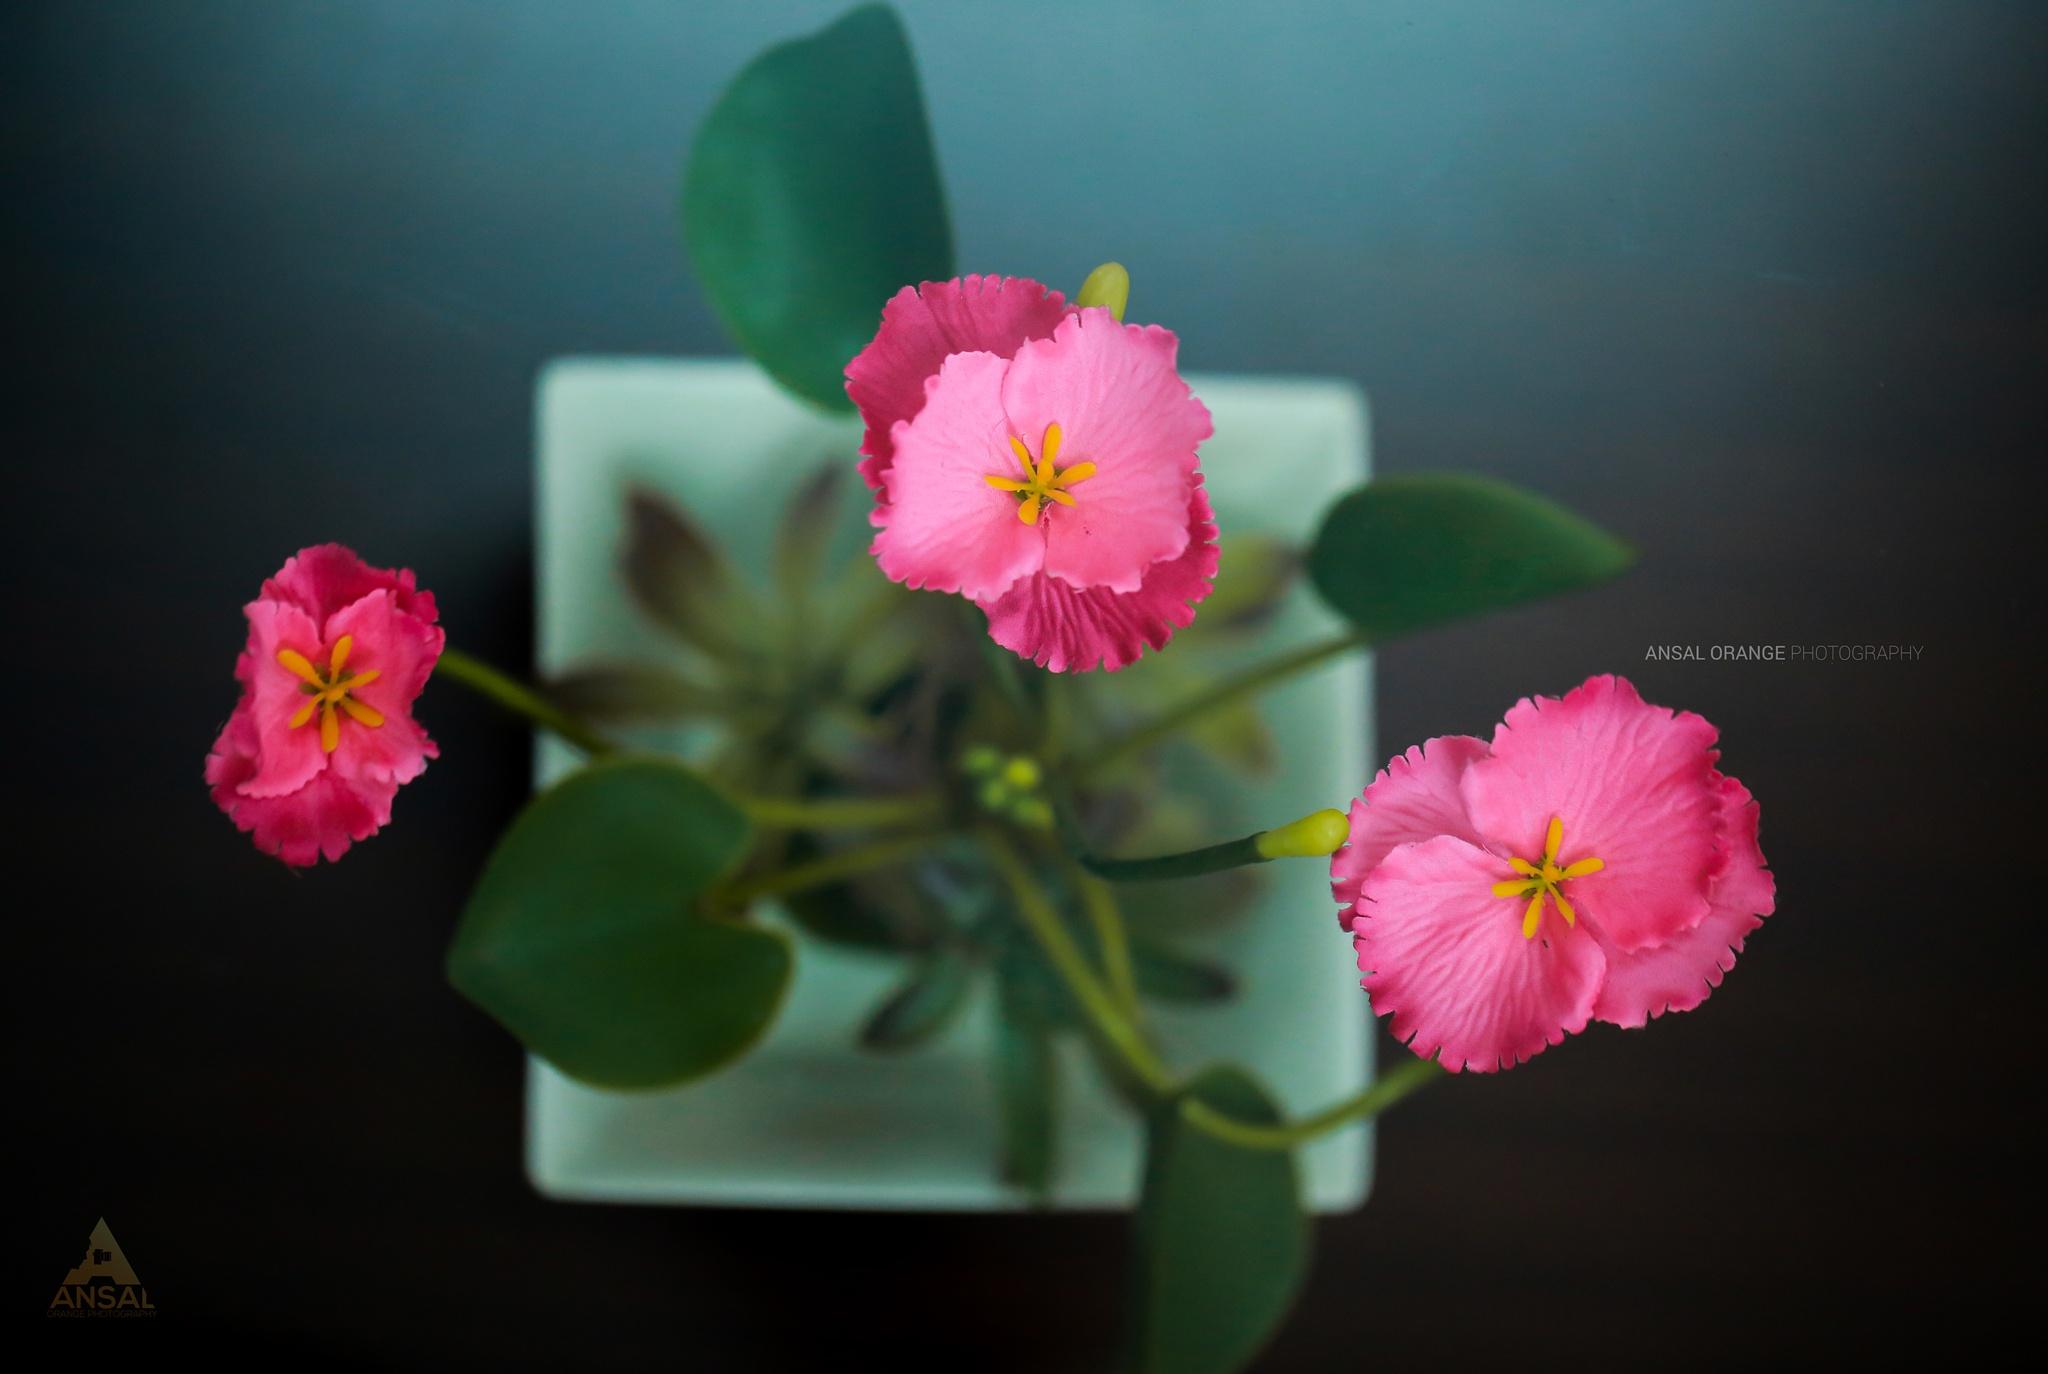 flowers by Ansal Orange